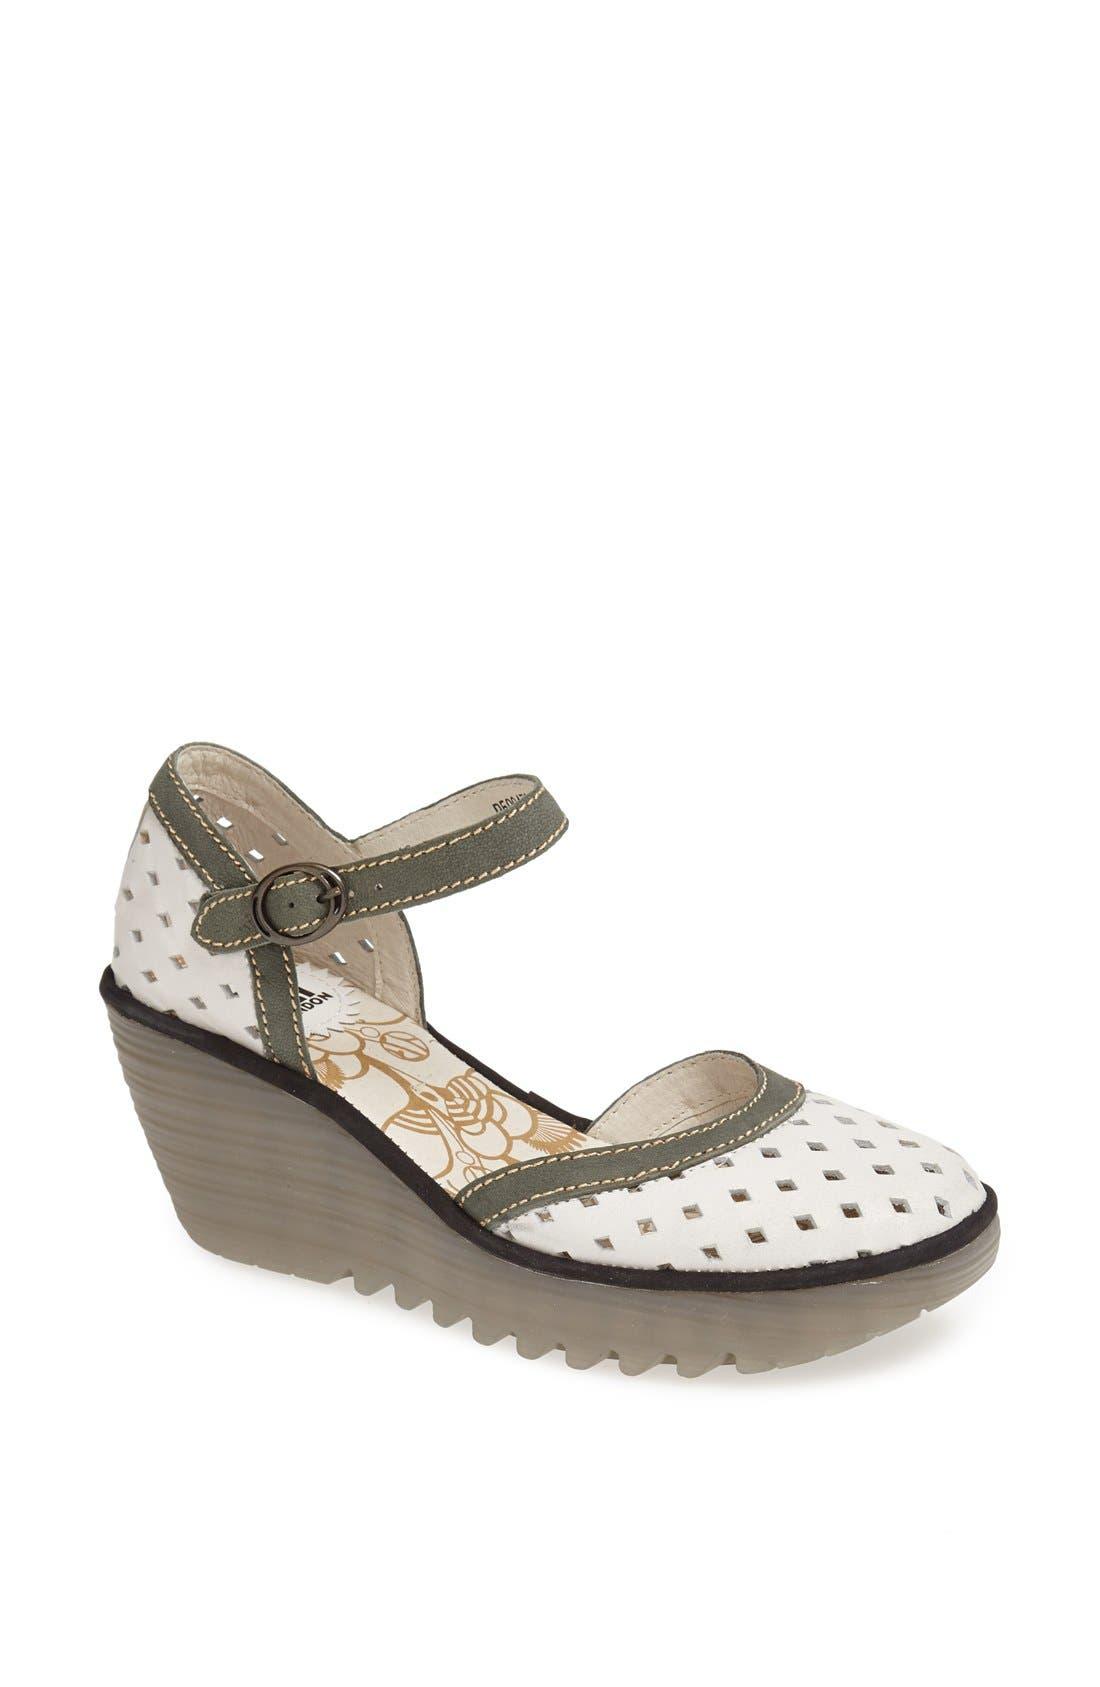 Main Image - Fly London 'Yana' Wedge Sandal